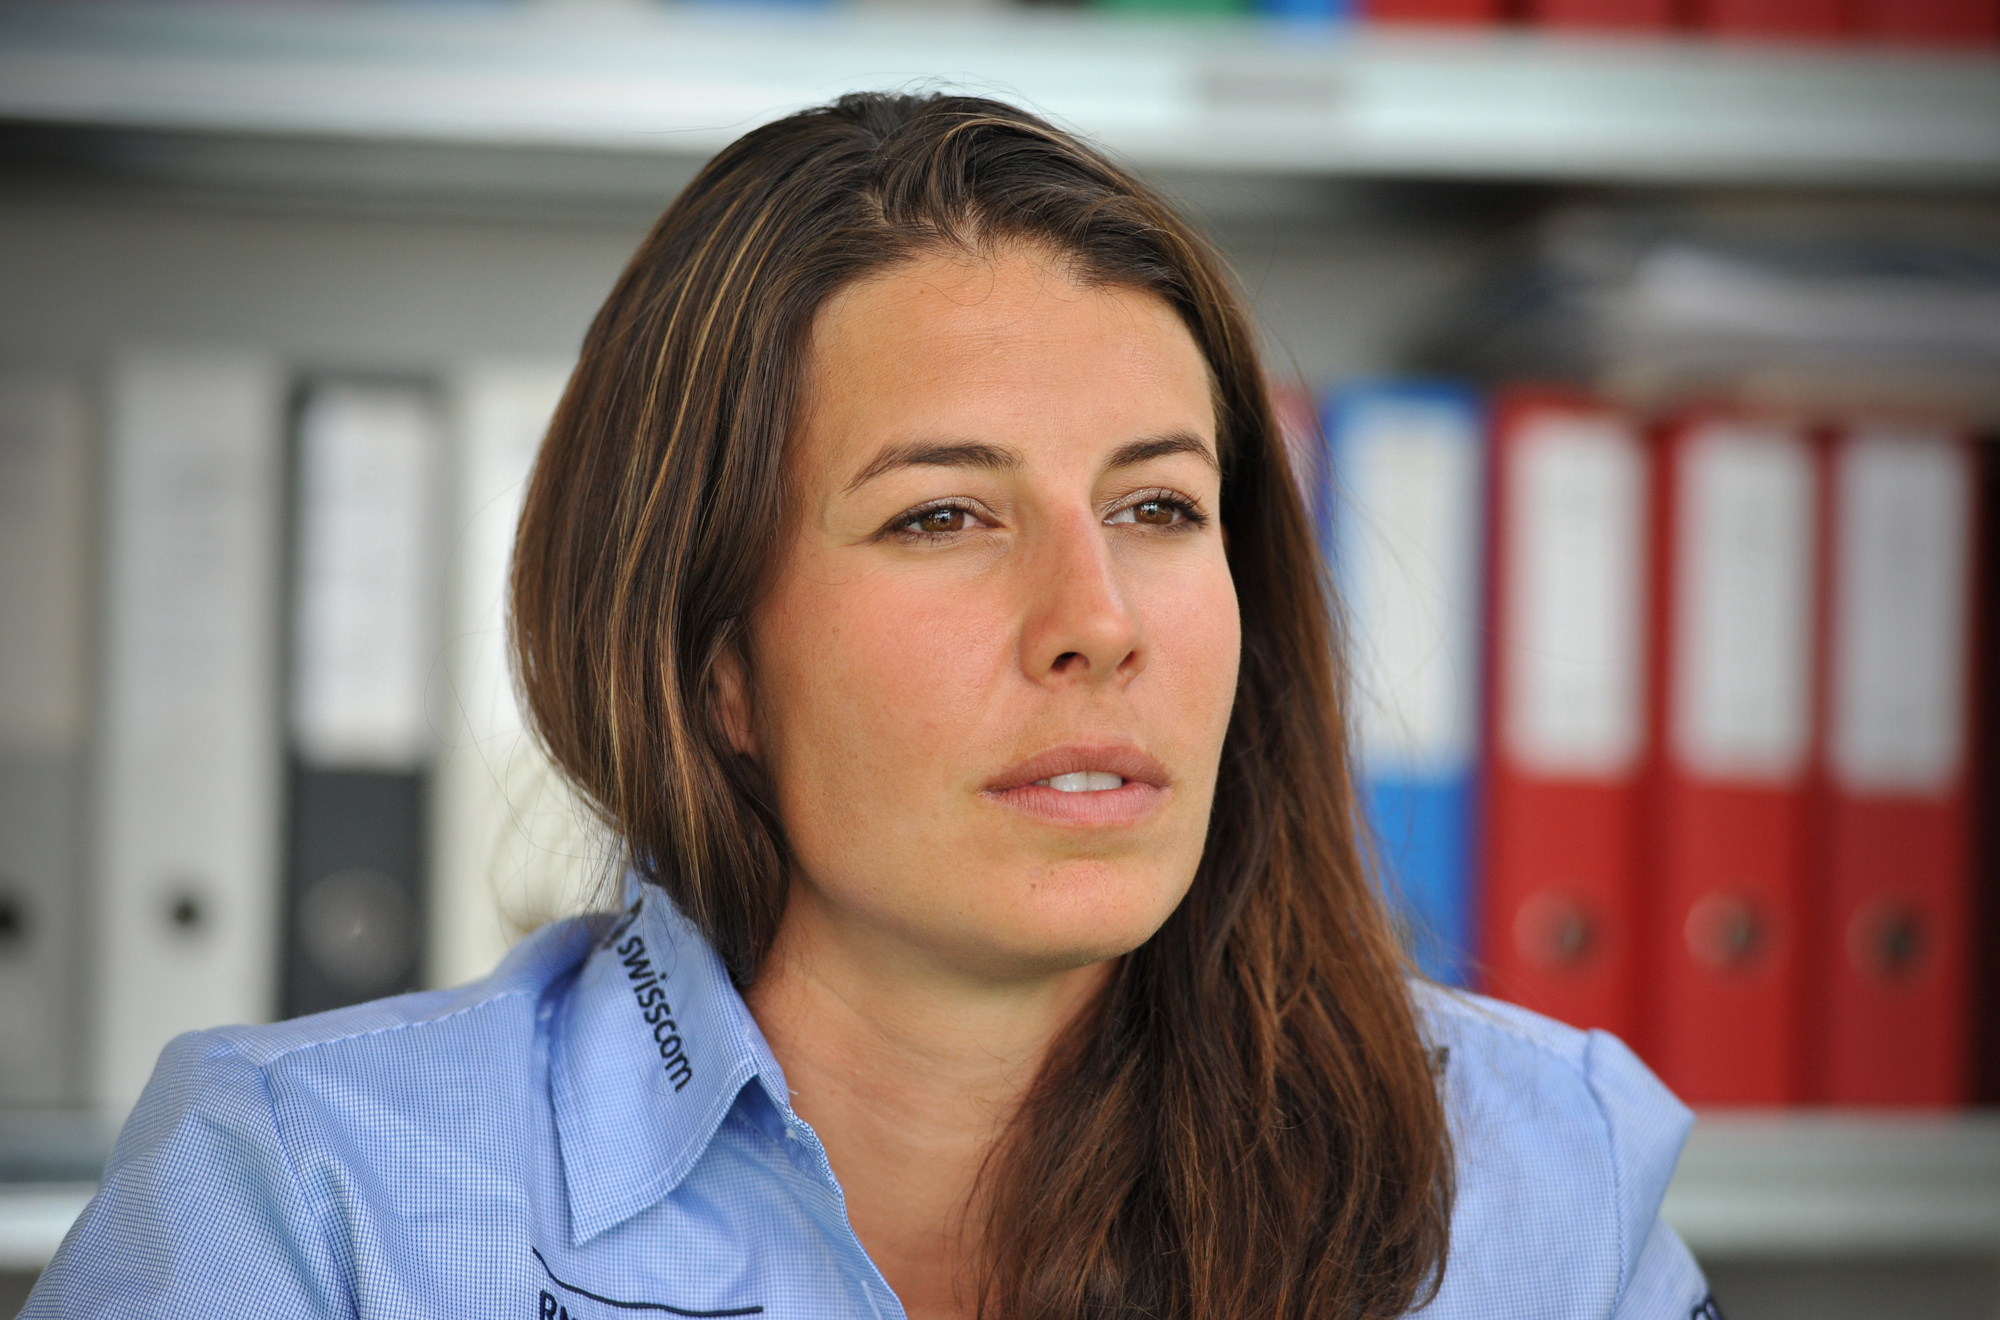 Dominique Gisin beim Interview im Sportmuseum, 2014